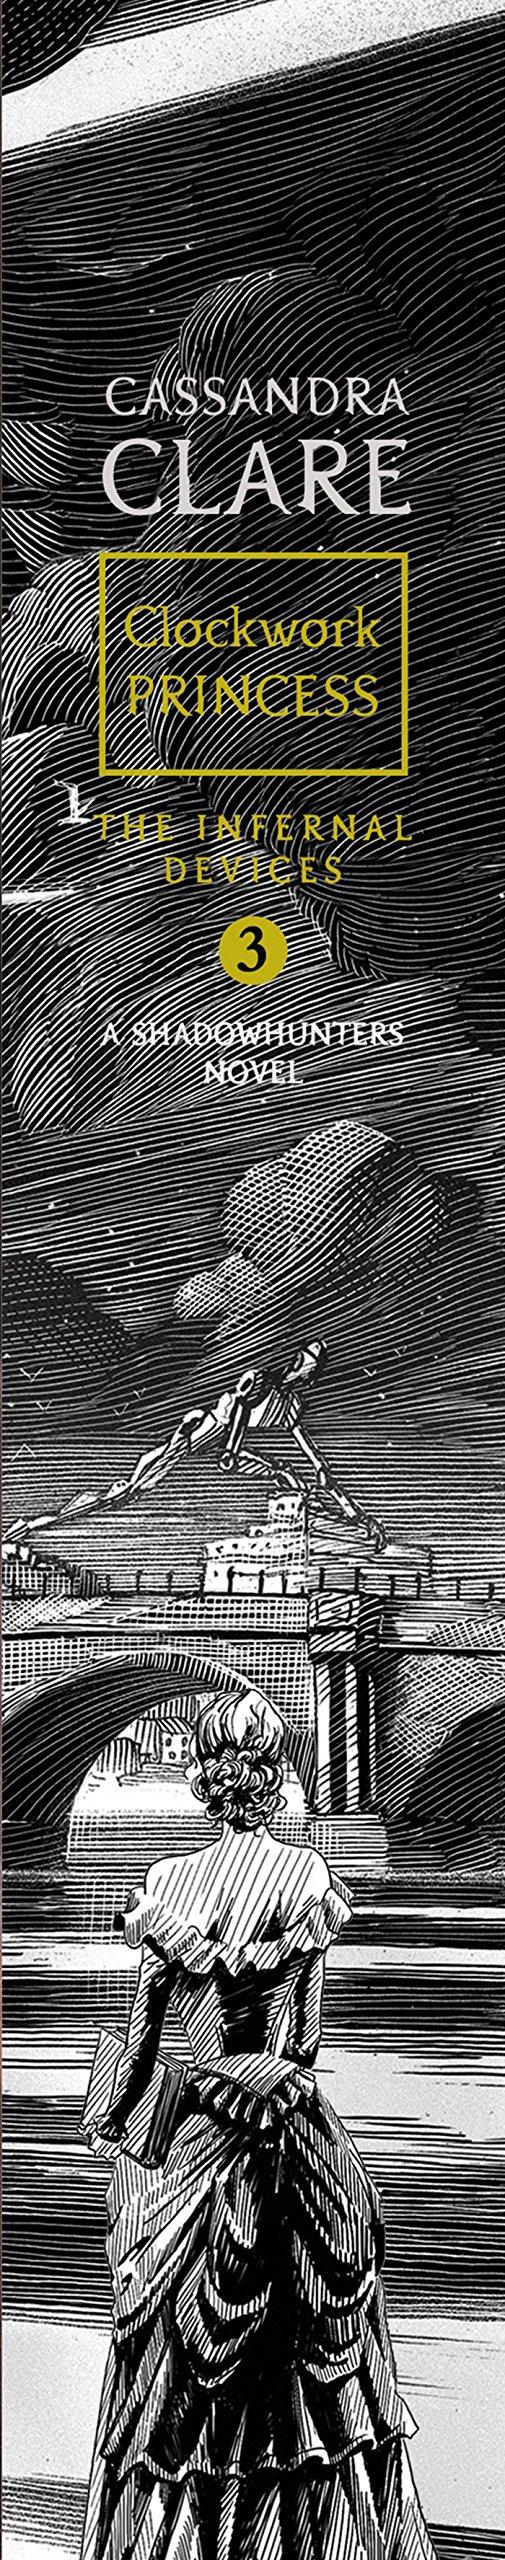 Amazon: Clockwork Princess (the Infernal Devices) (9781481456036):  Cassandra Clare: Books